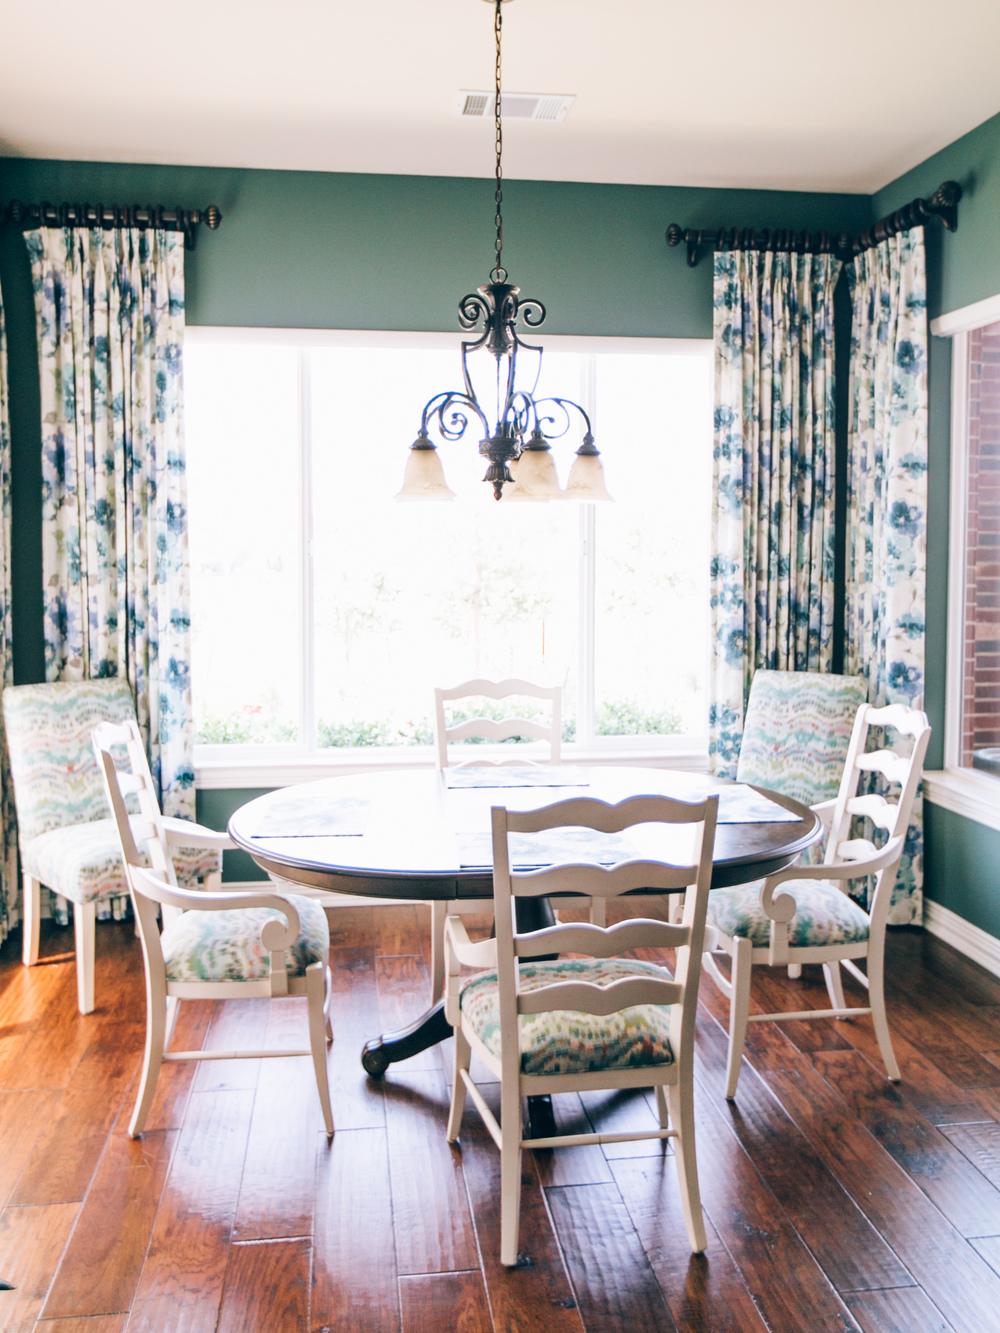 Interior-design-home-decorating-274.jpg